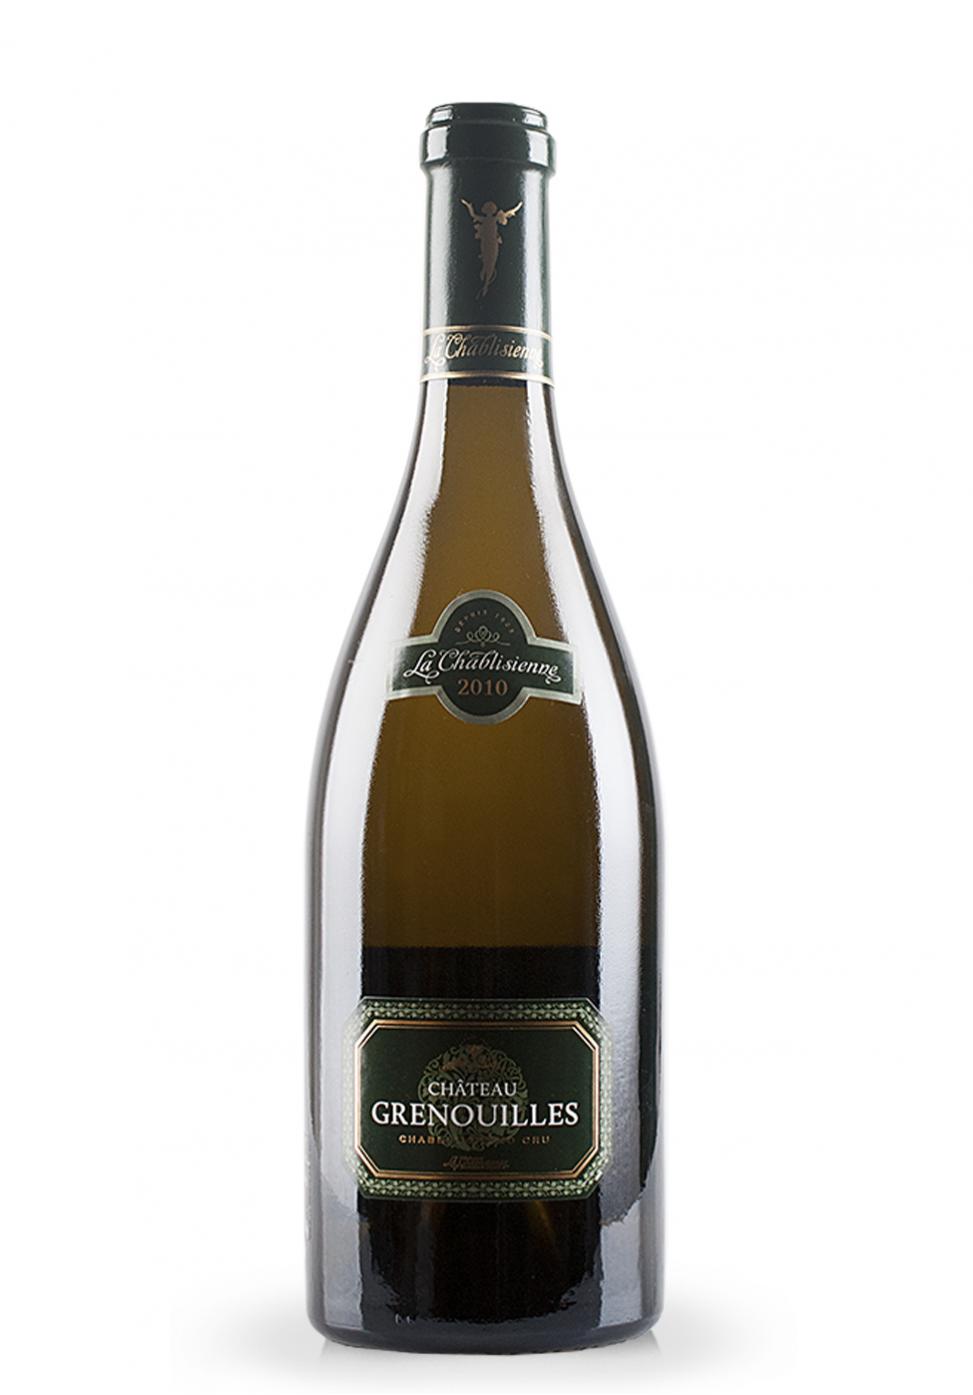 Vin Château Grenouilles, Chablis Grand Cru 2010 (0.75L)